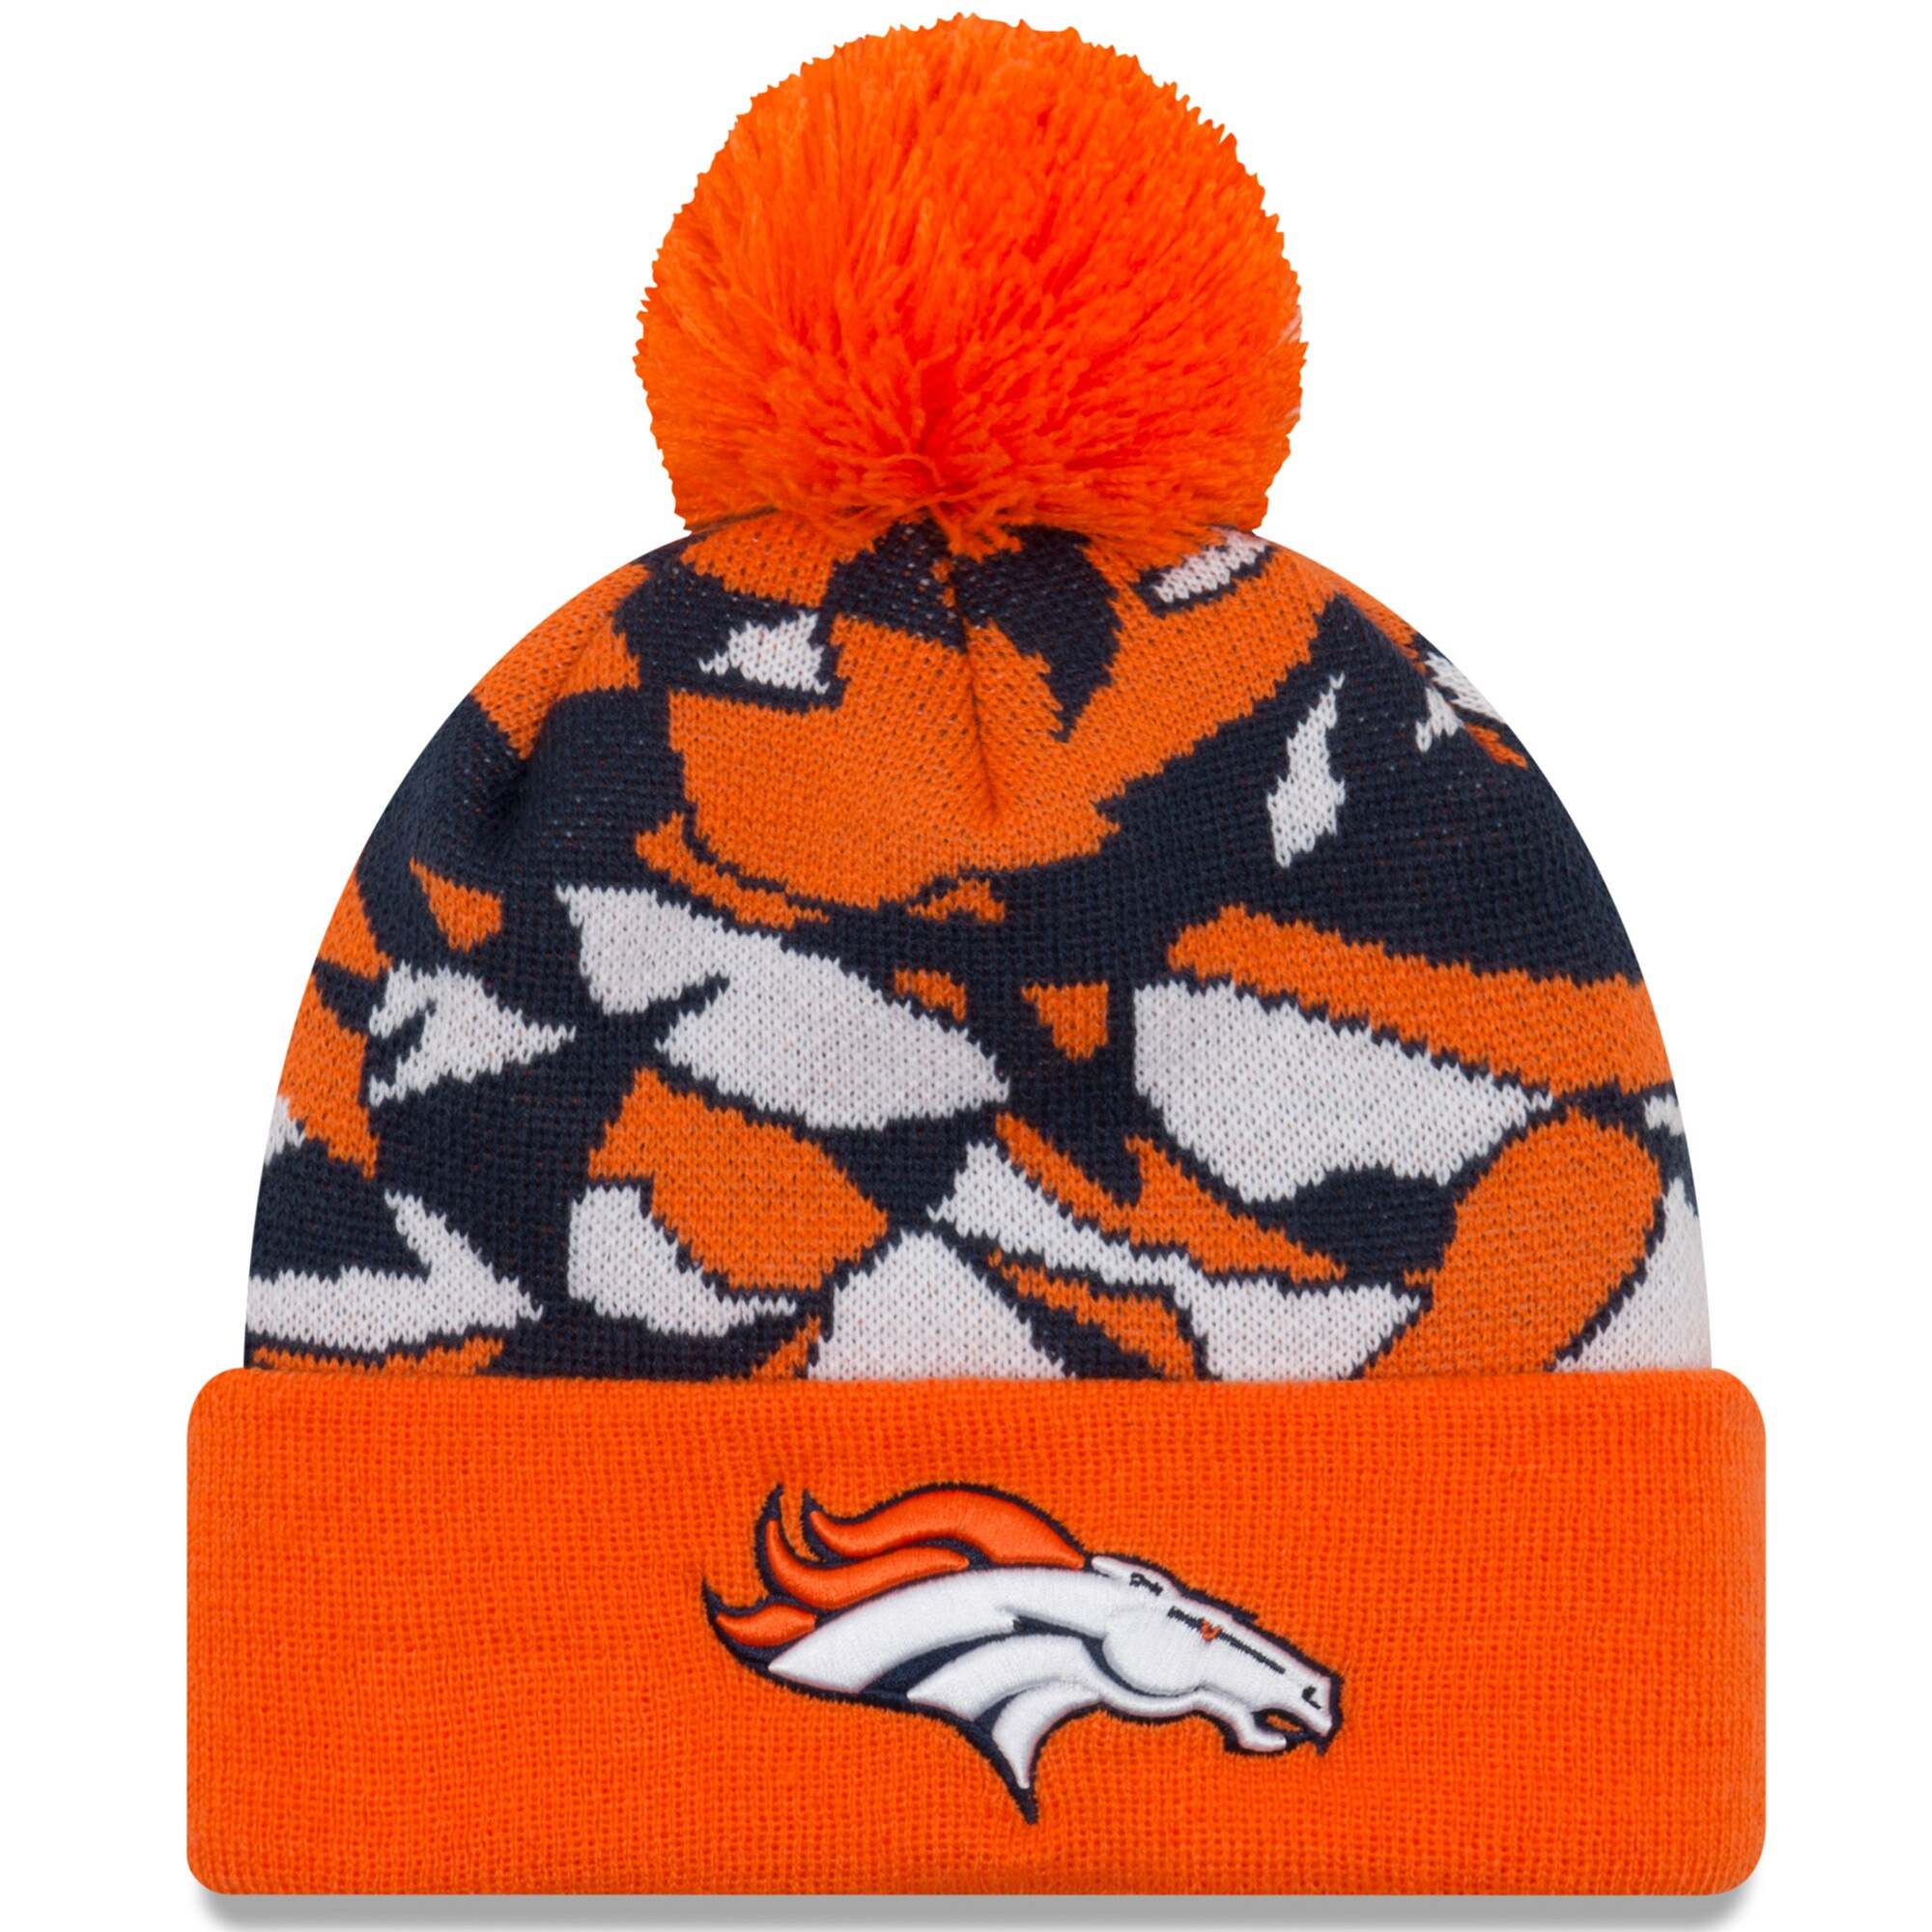 Denver Broncos New Era NFLxFIT Cuffed Knit Hat with Pom - Orange